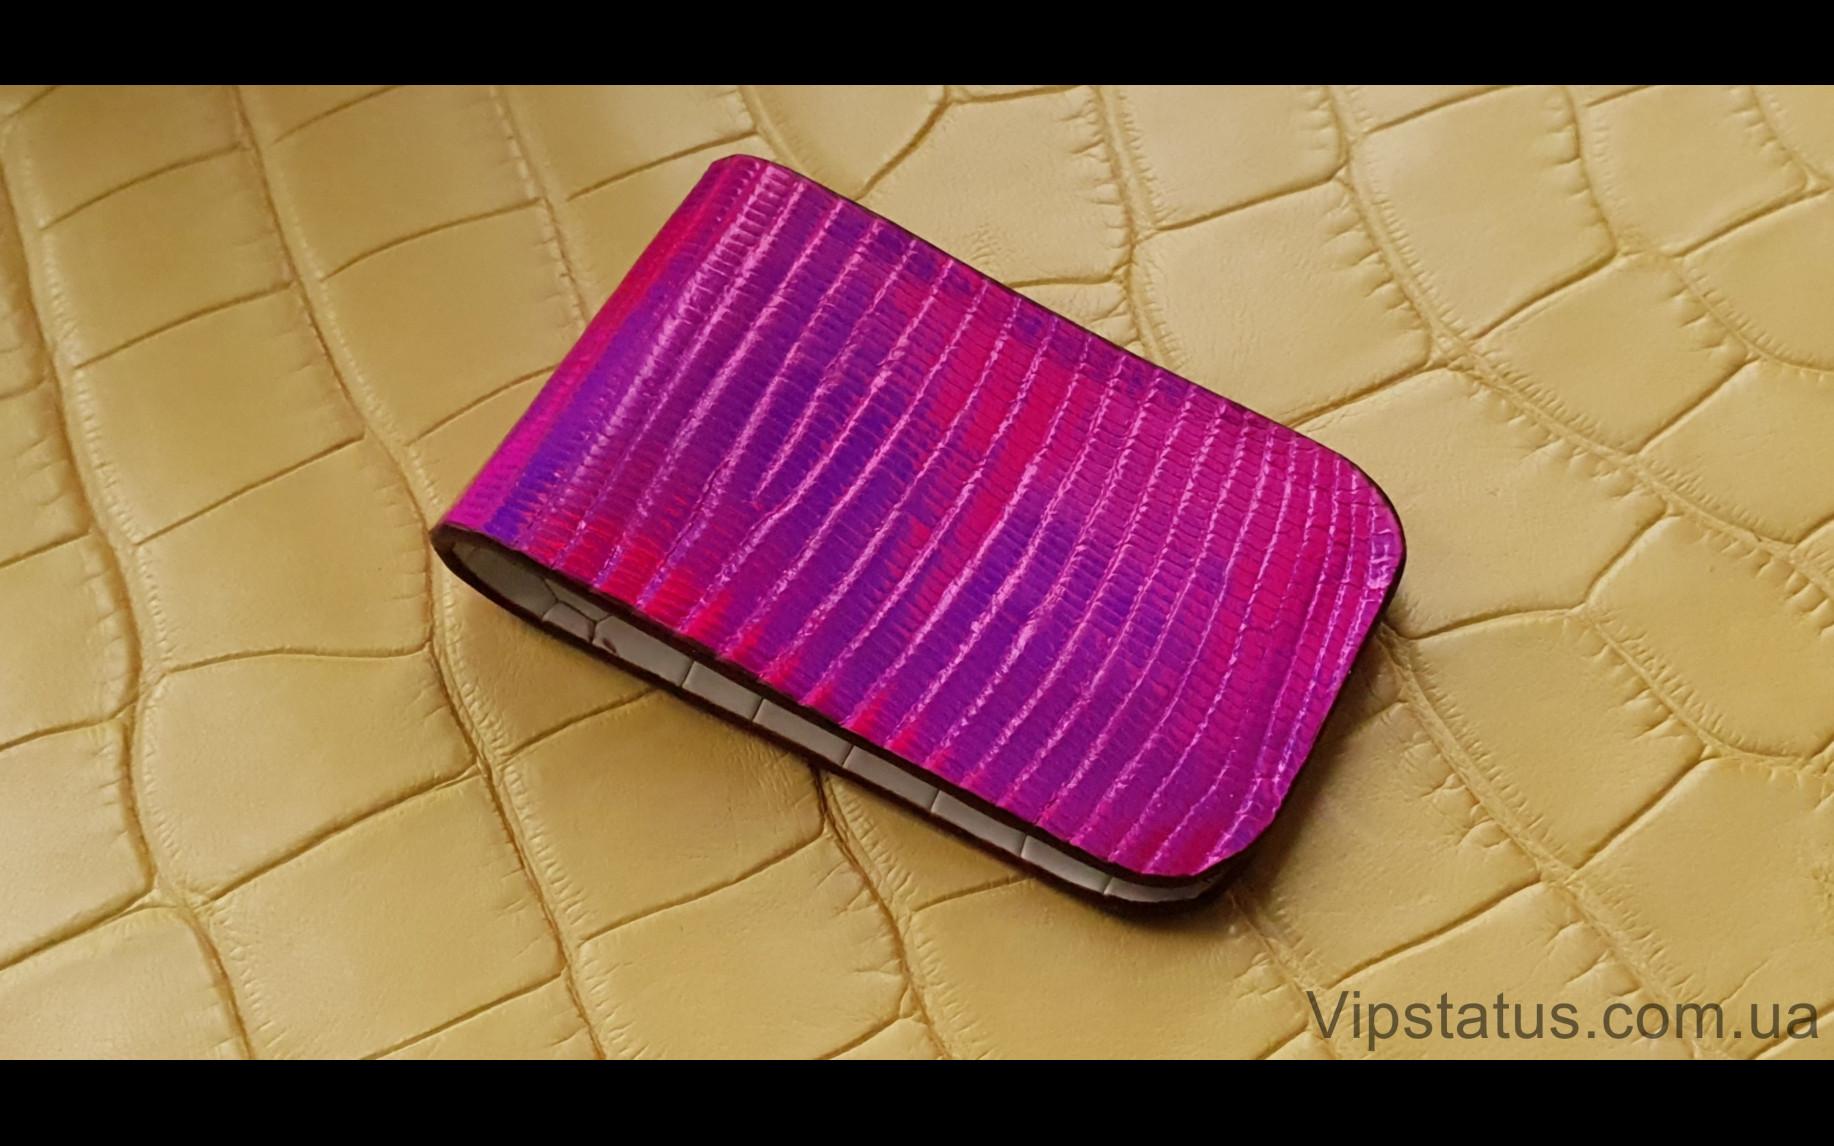 Elite Pink Rose Лакшери зажим для купюр Pink Rose Luxury bill clip image 2